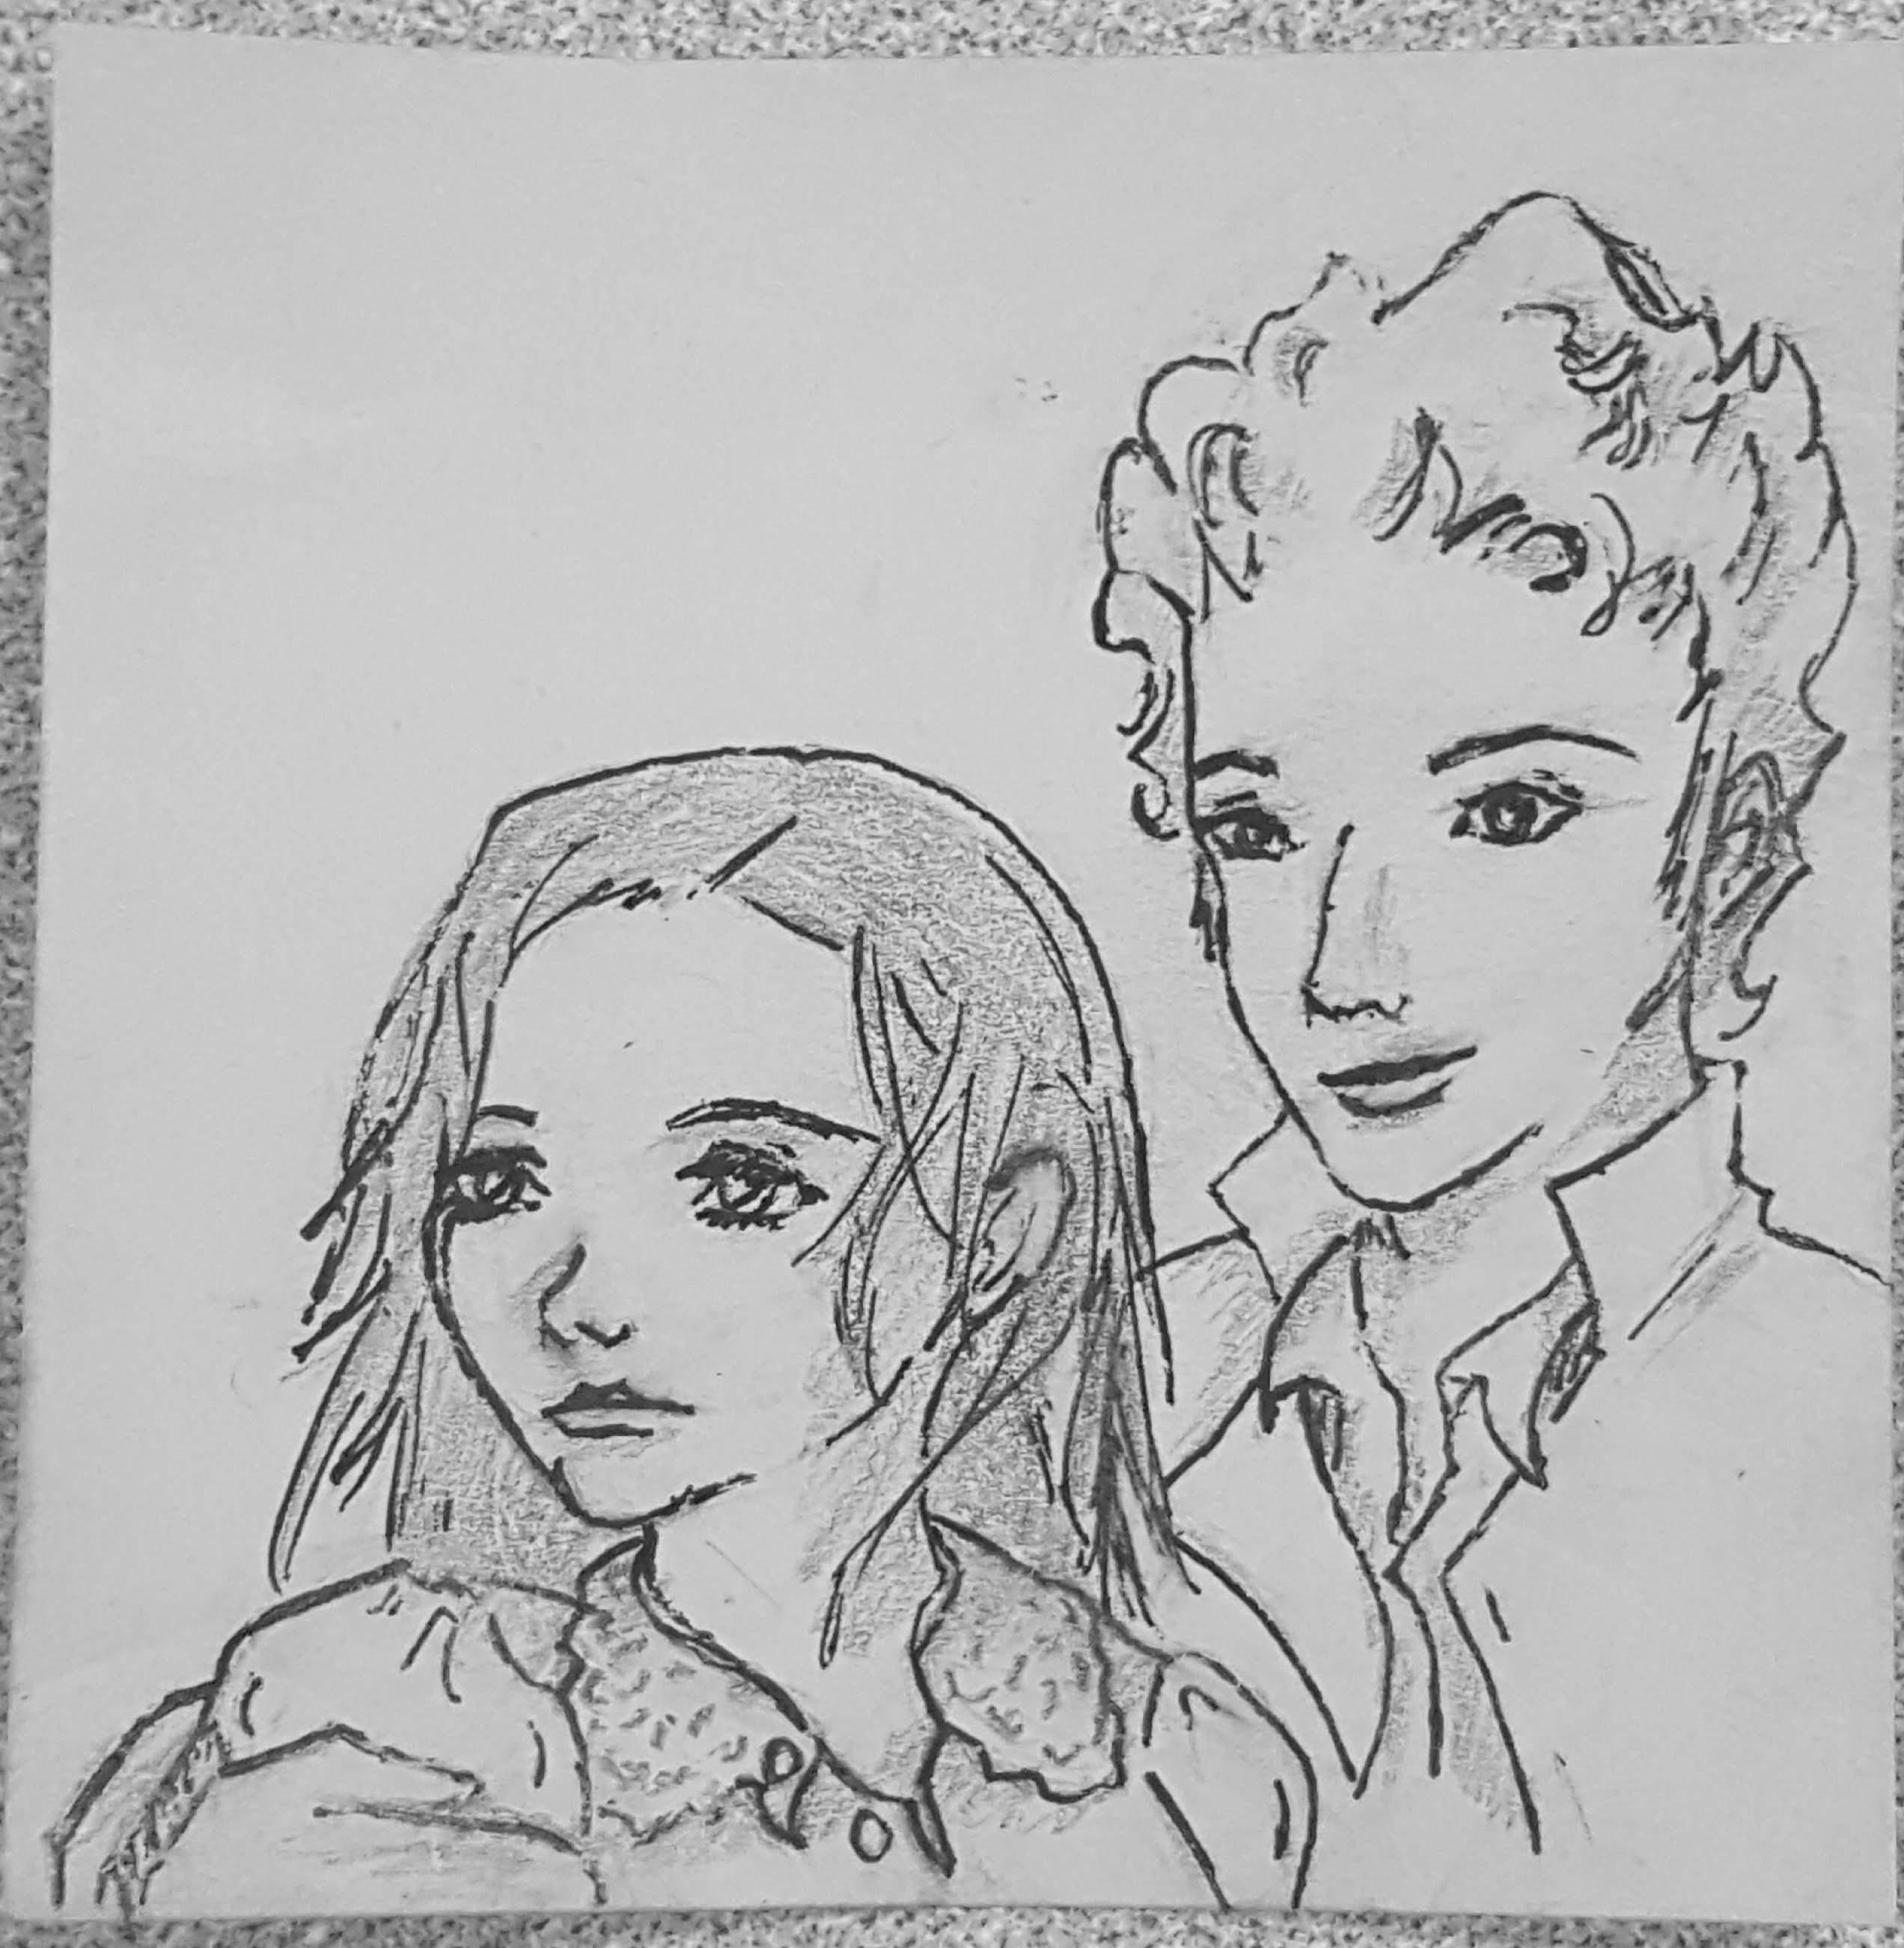 Clover and Saint Smithy